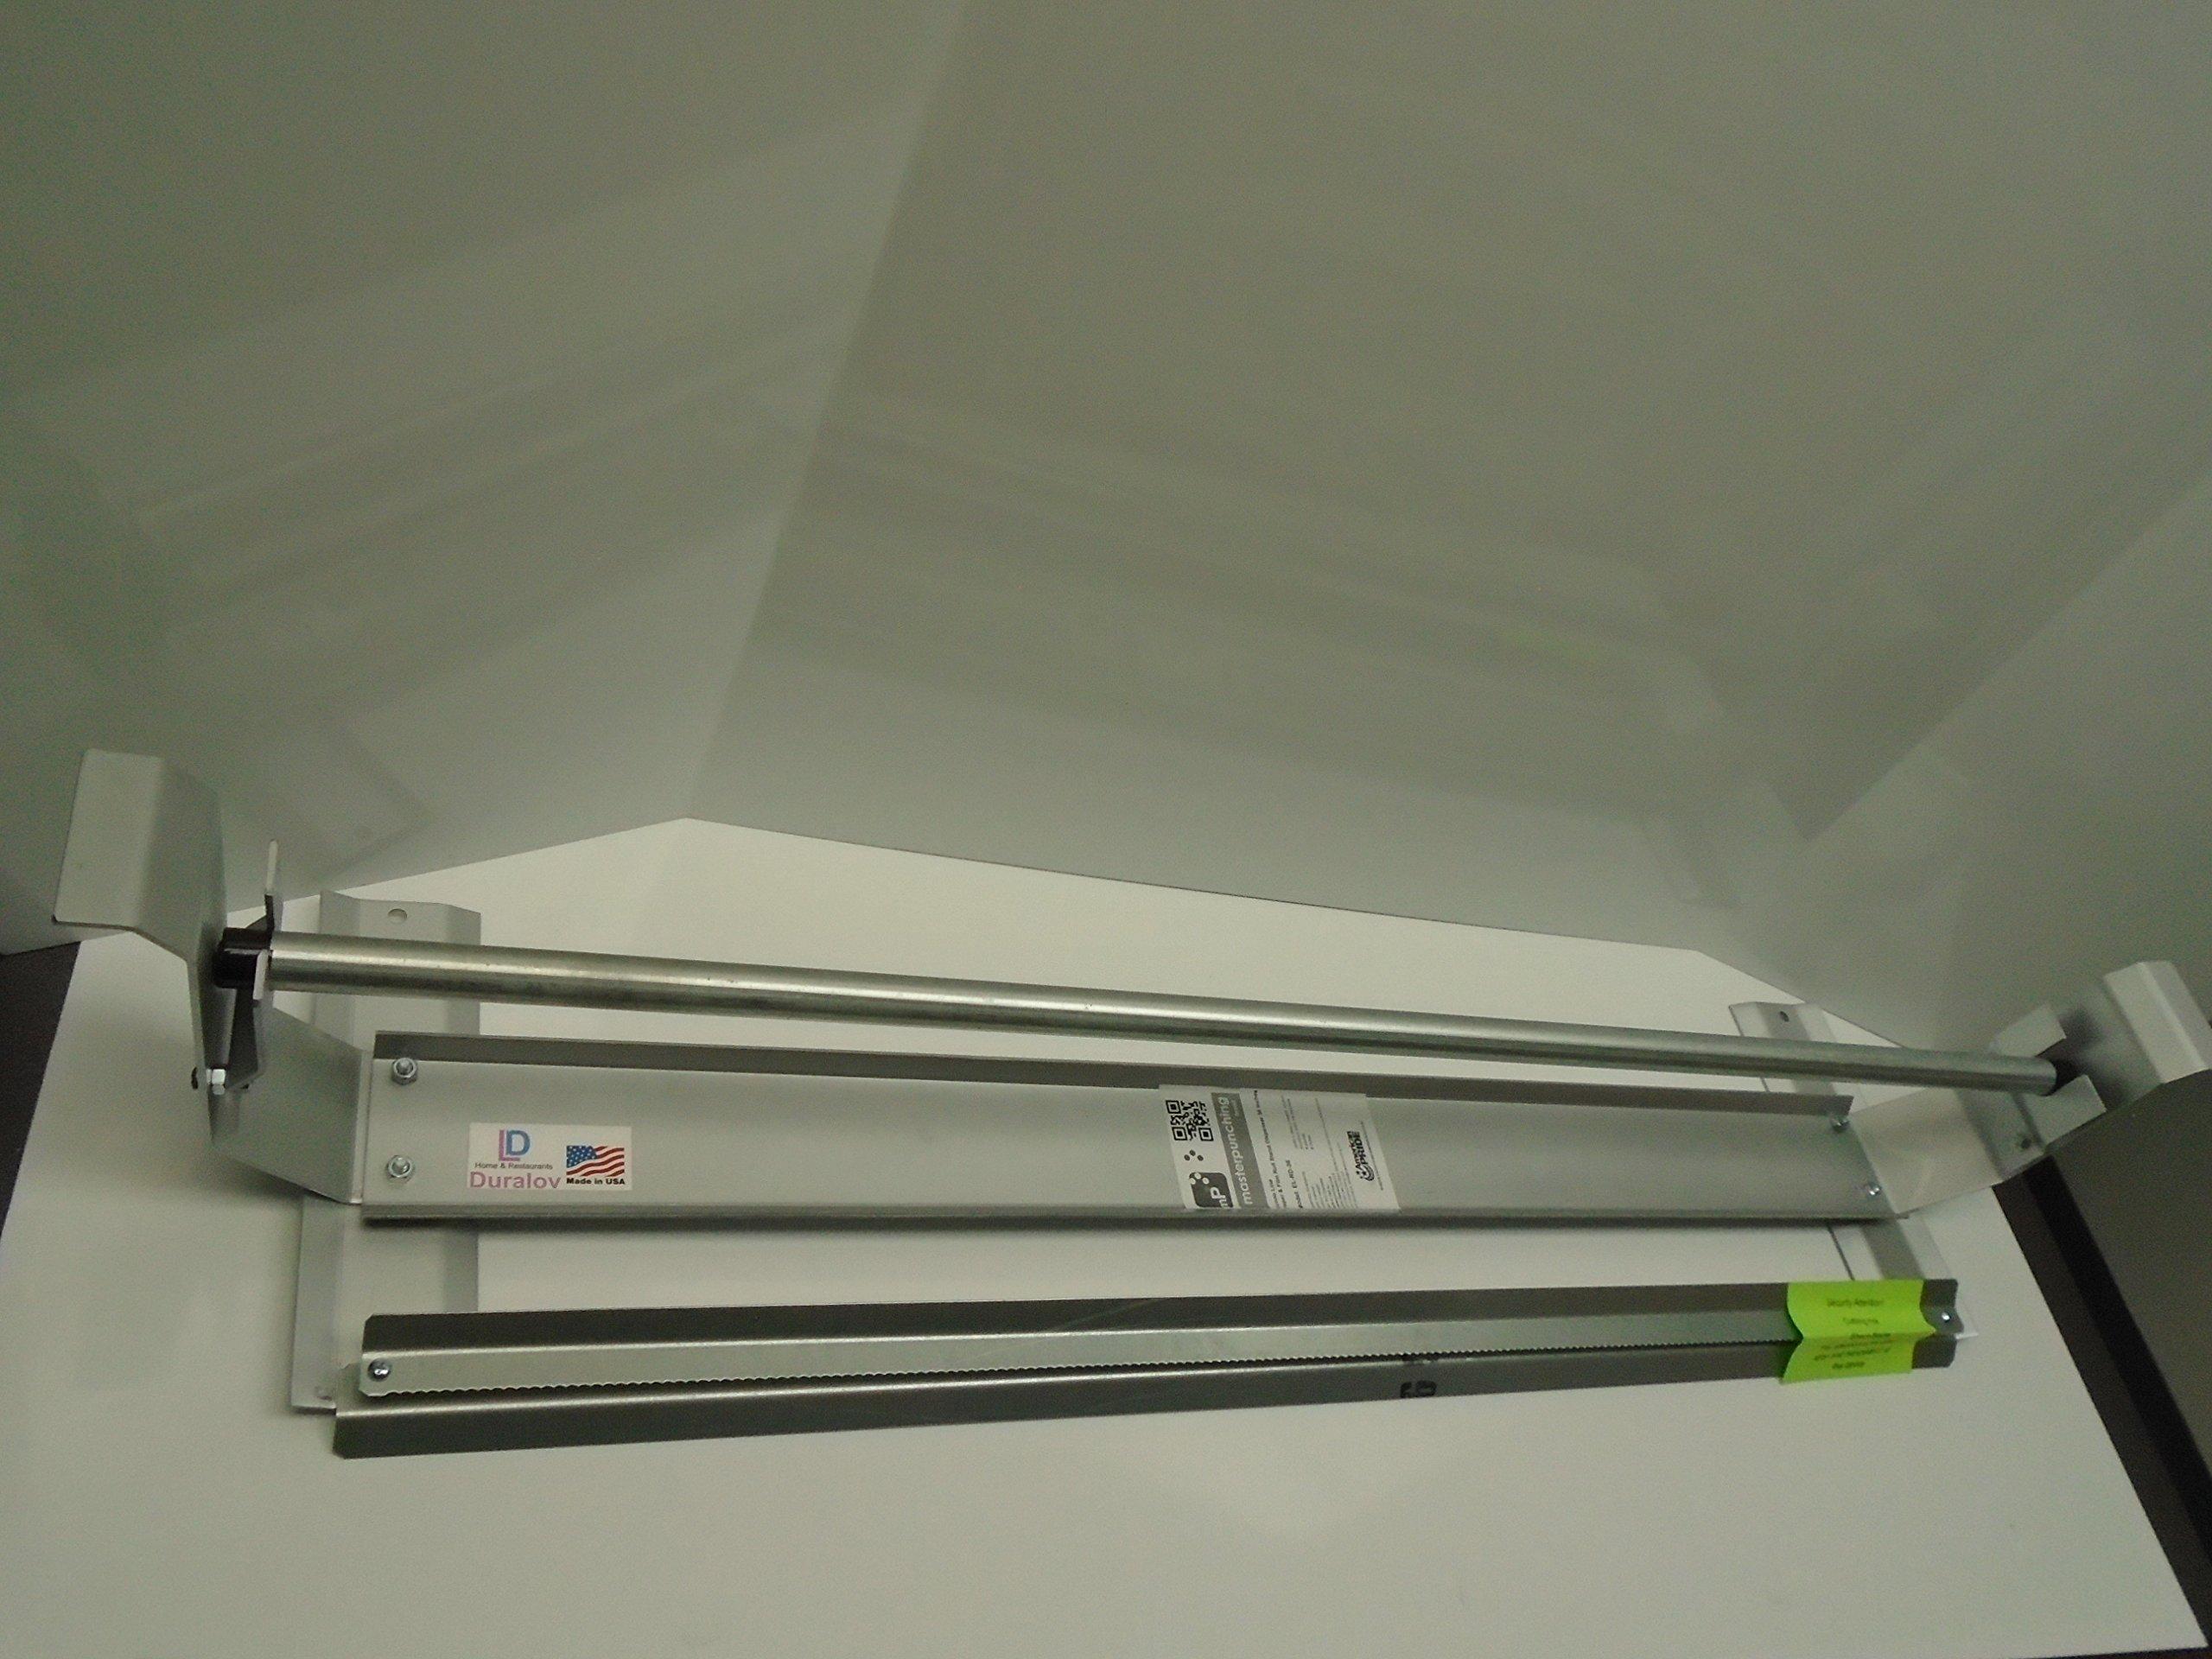 Paper Cutter Roll Dispenser Econoline 60 inches table mount Kraft paper Duralov by Duralov (Image #6)